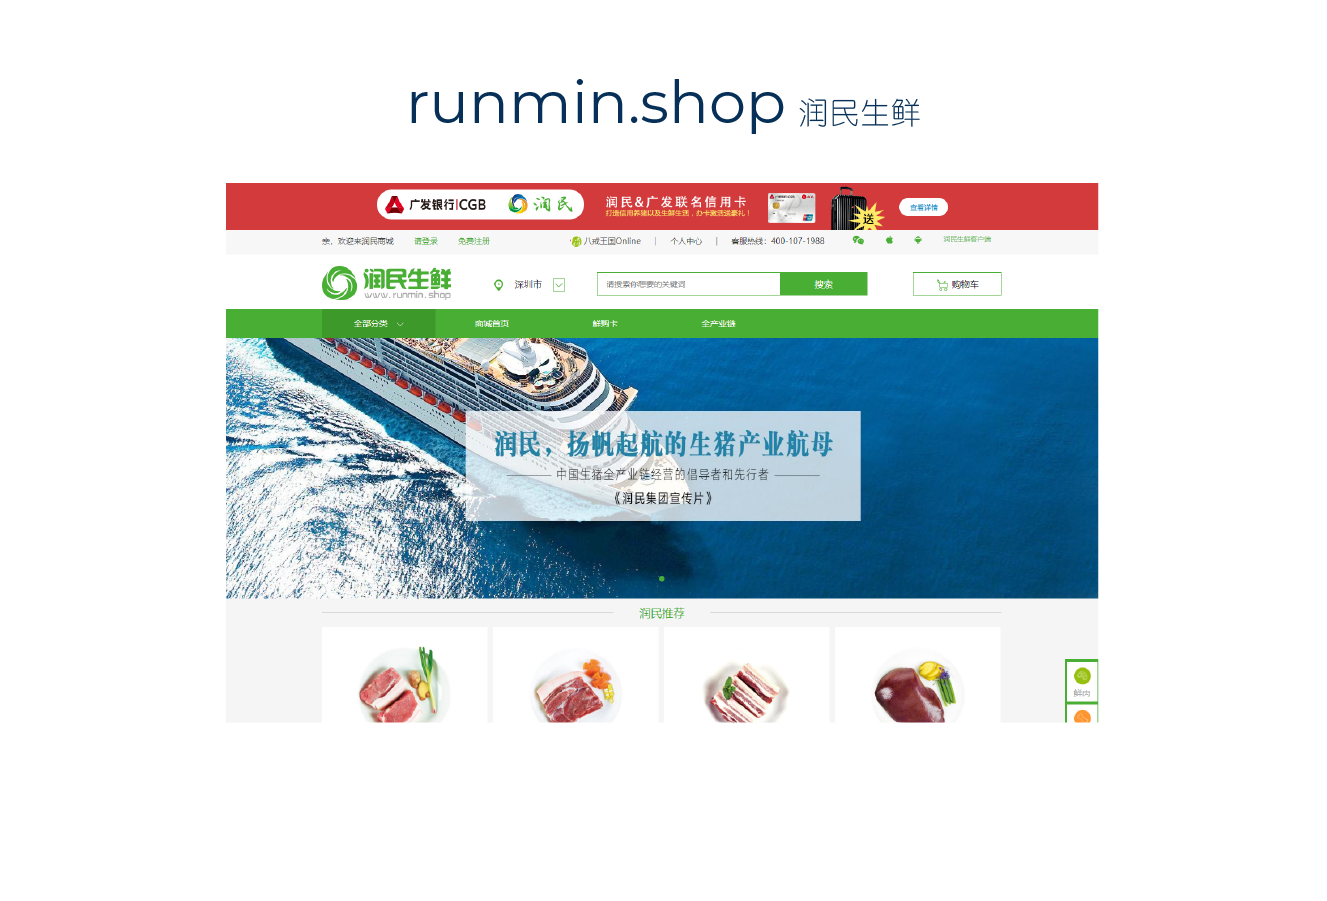 runmin.shop